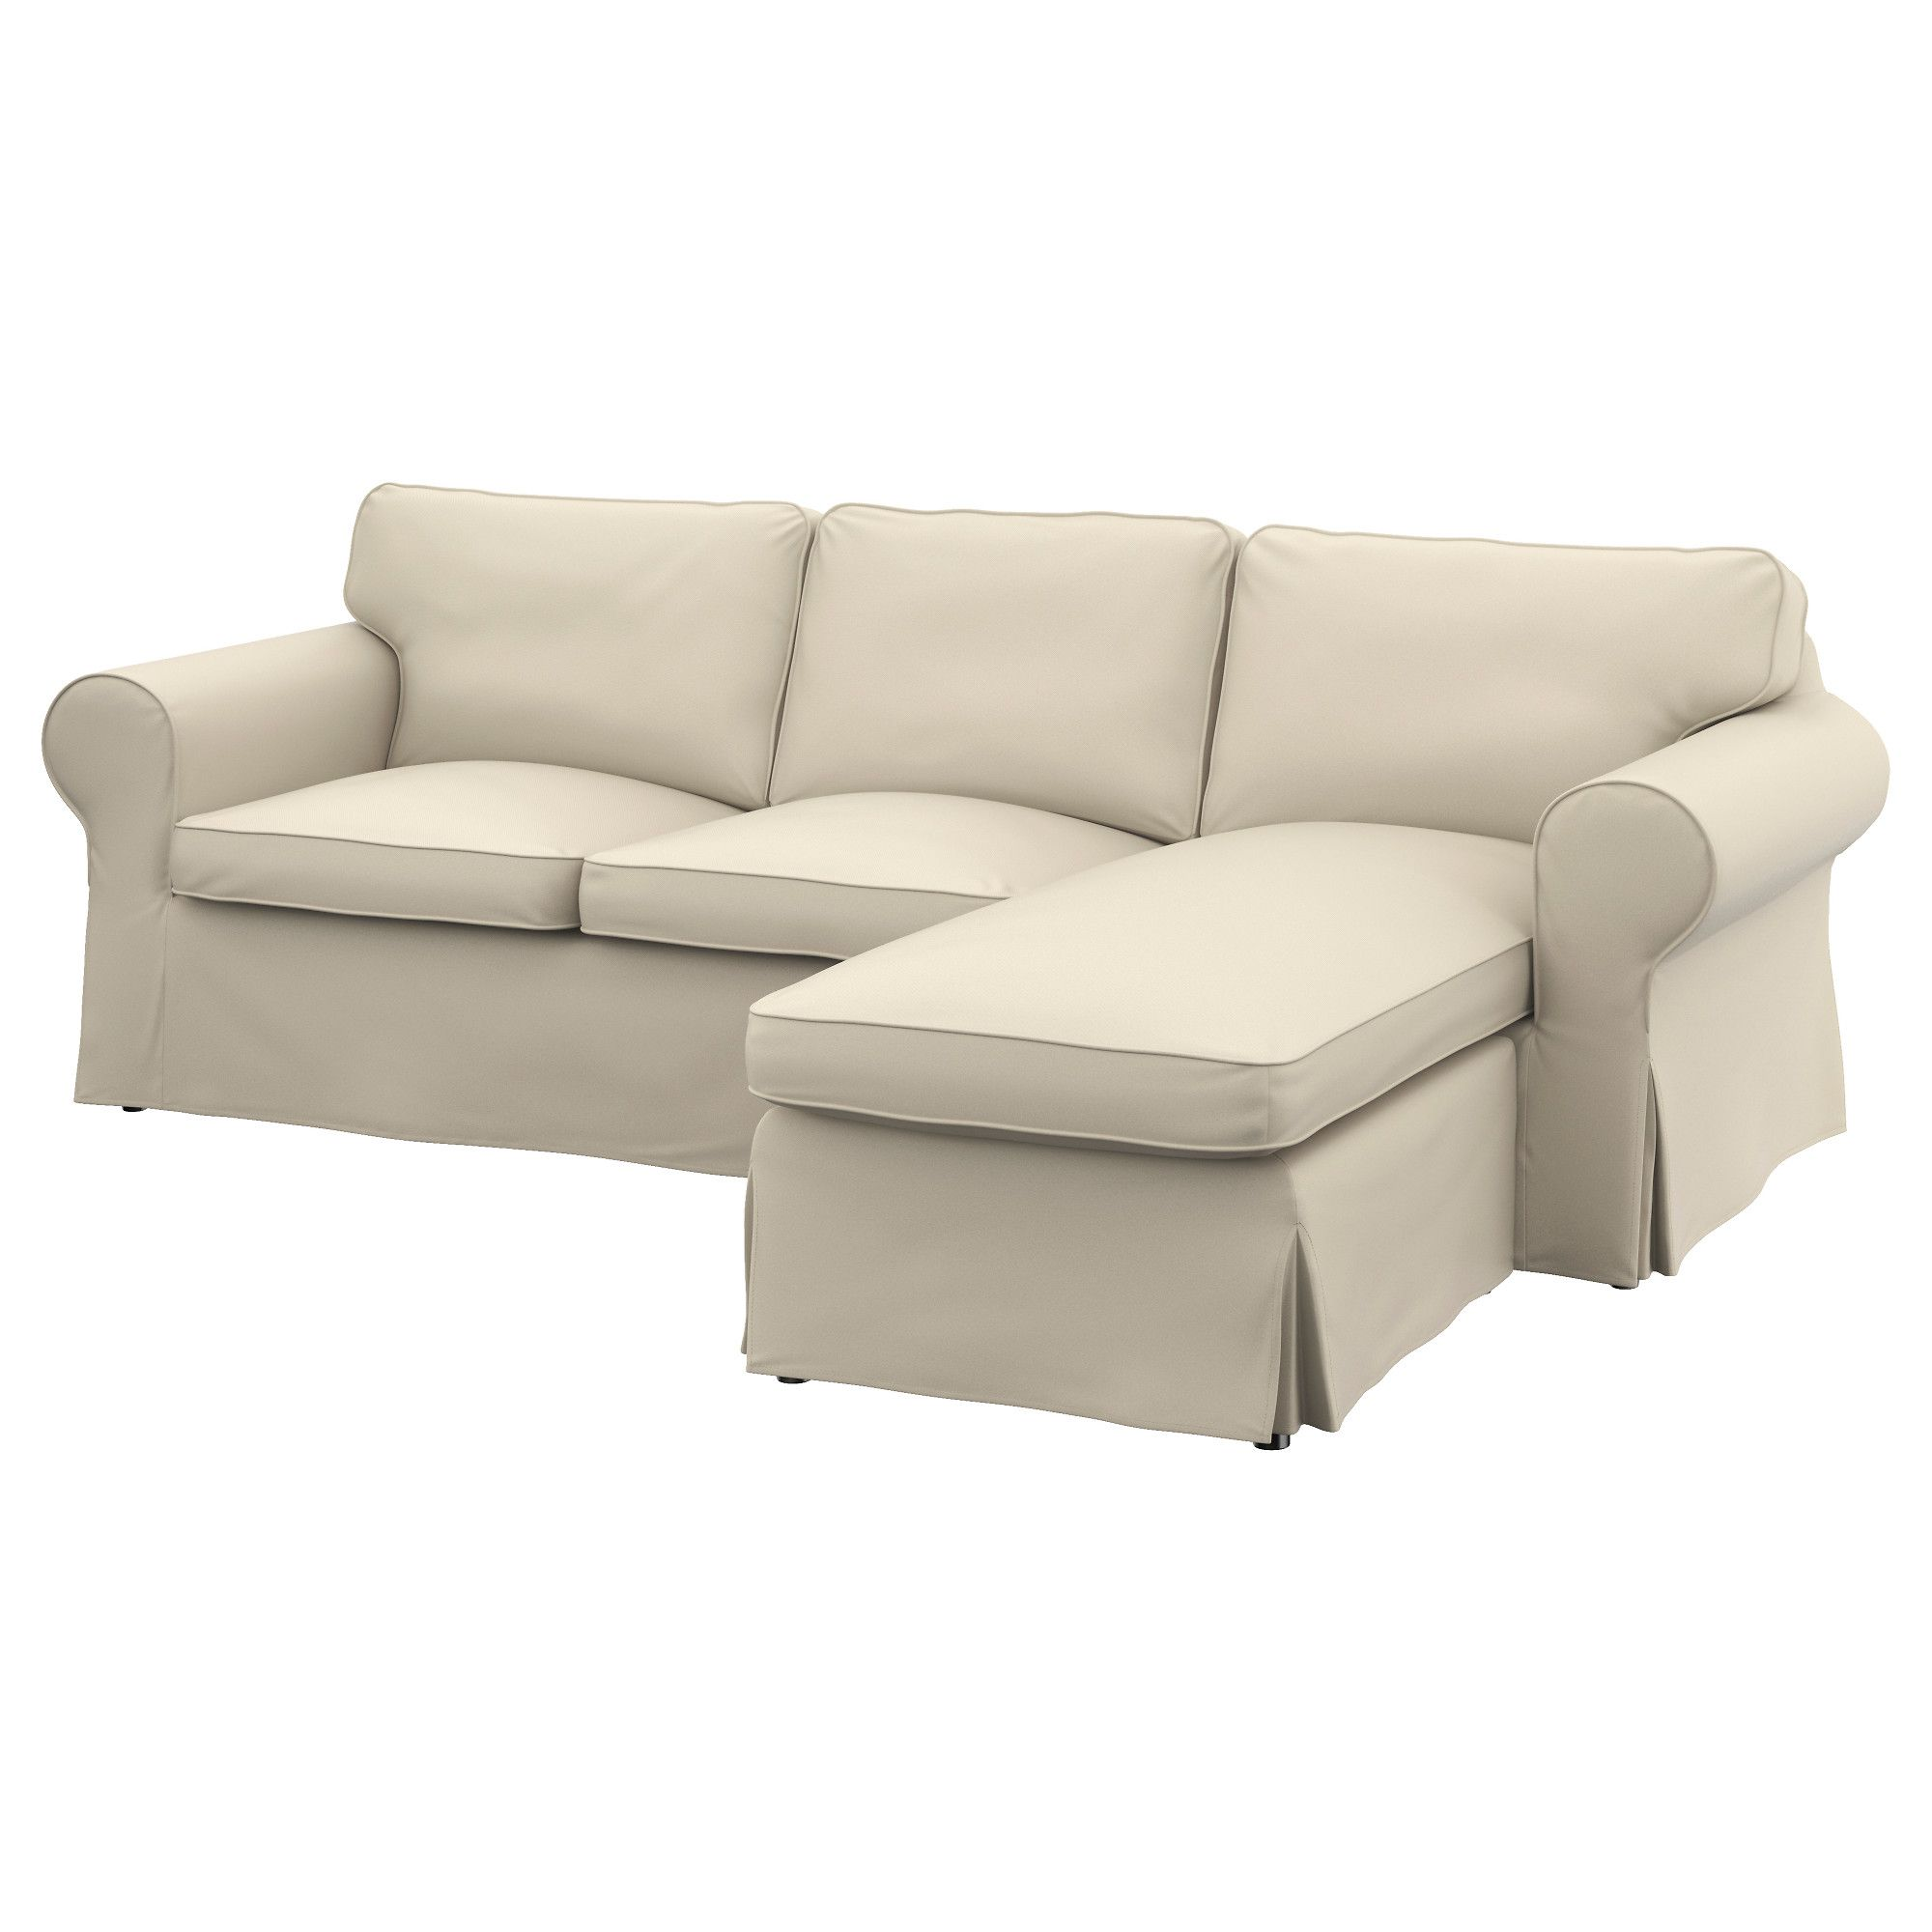 Ikea Ektorp Cover Two Seat Sofa W Chaise Longue Furniture